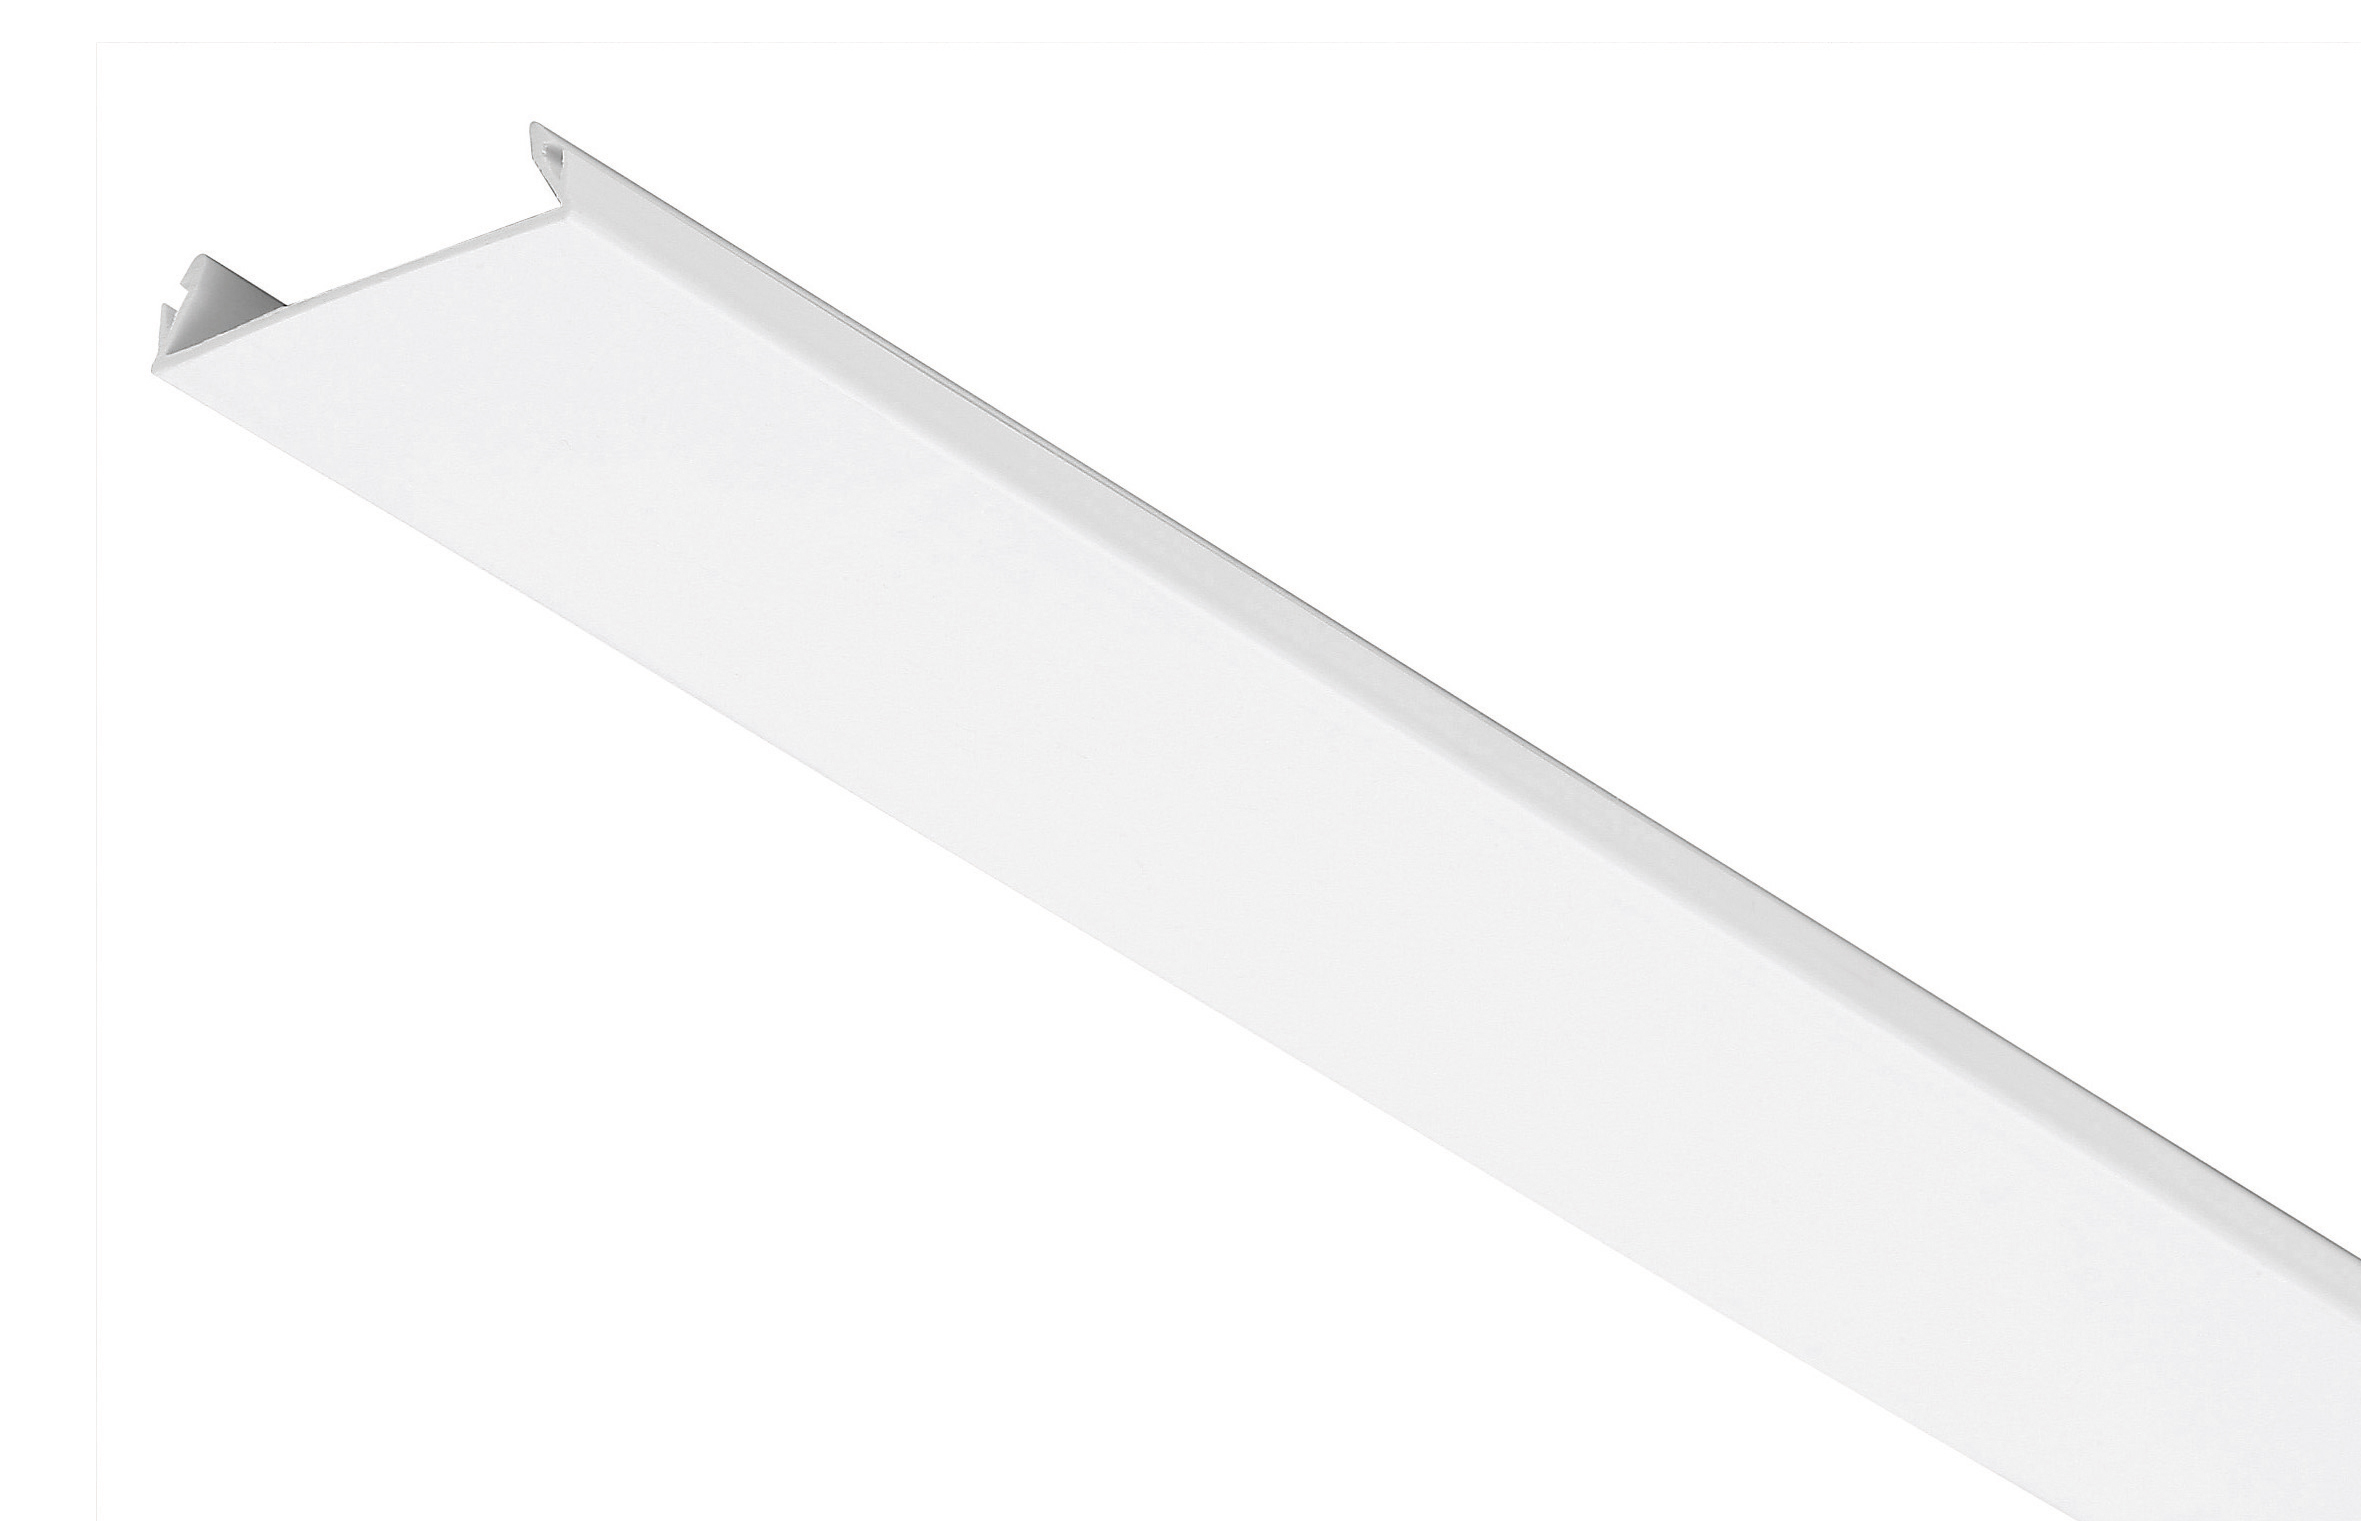 1 Stk L-SE Blindabdeckung DM T8 aus Kunststoff, Weiß LI99000142